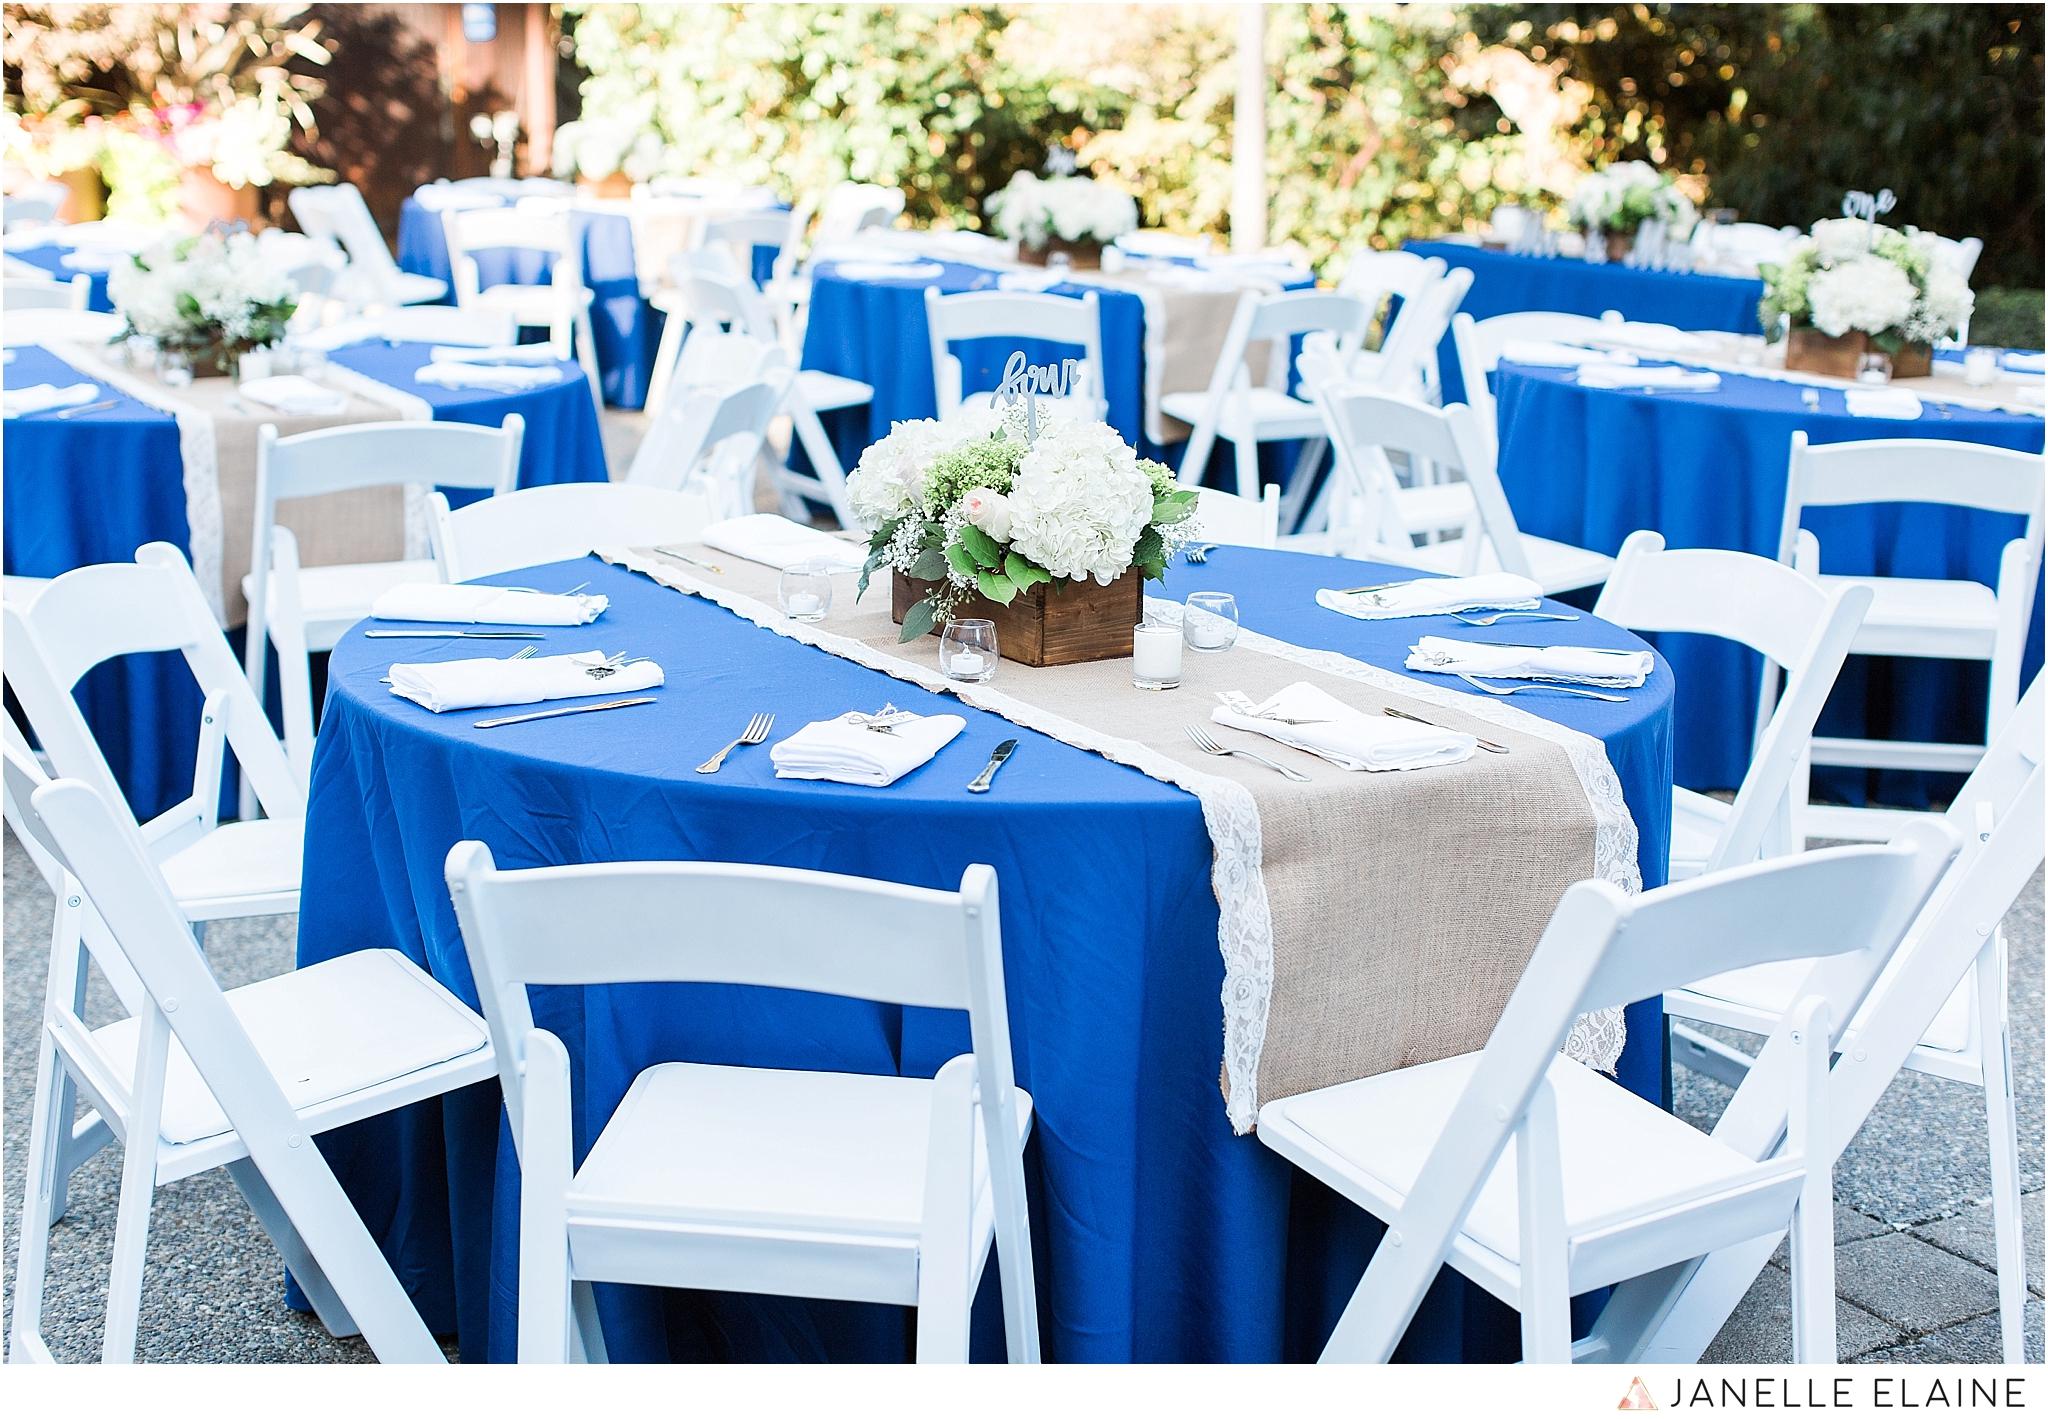 janelle elaine photography-professional wedding photographer-seattle-bellevue-robinswood house-101.jpg